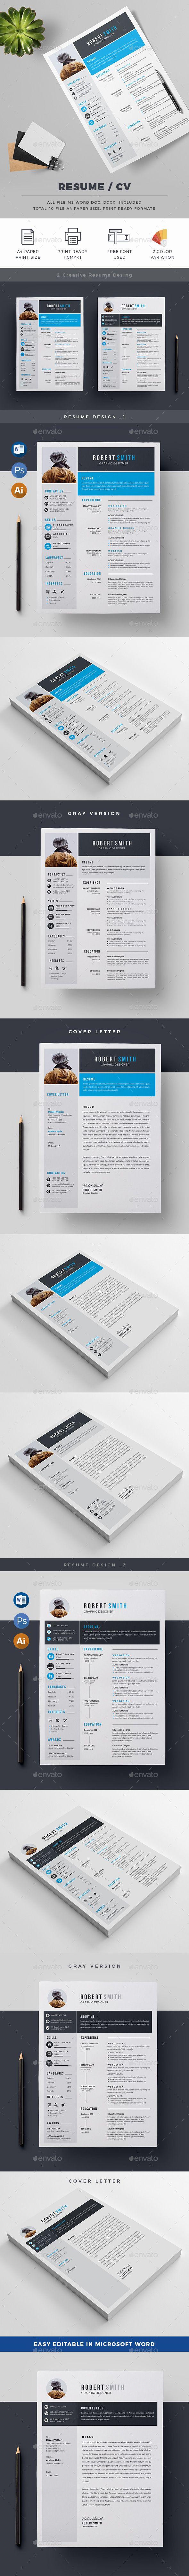 Resume Template MS WORD, PSD & Illustrator